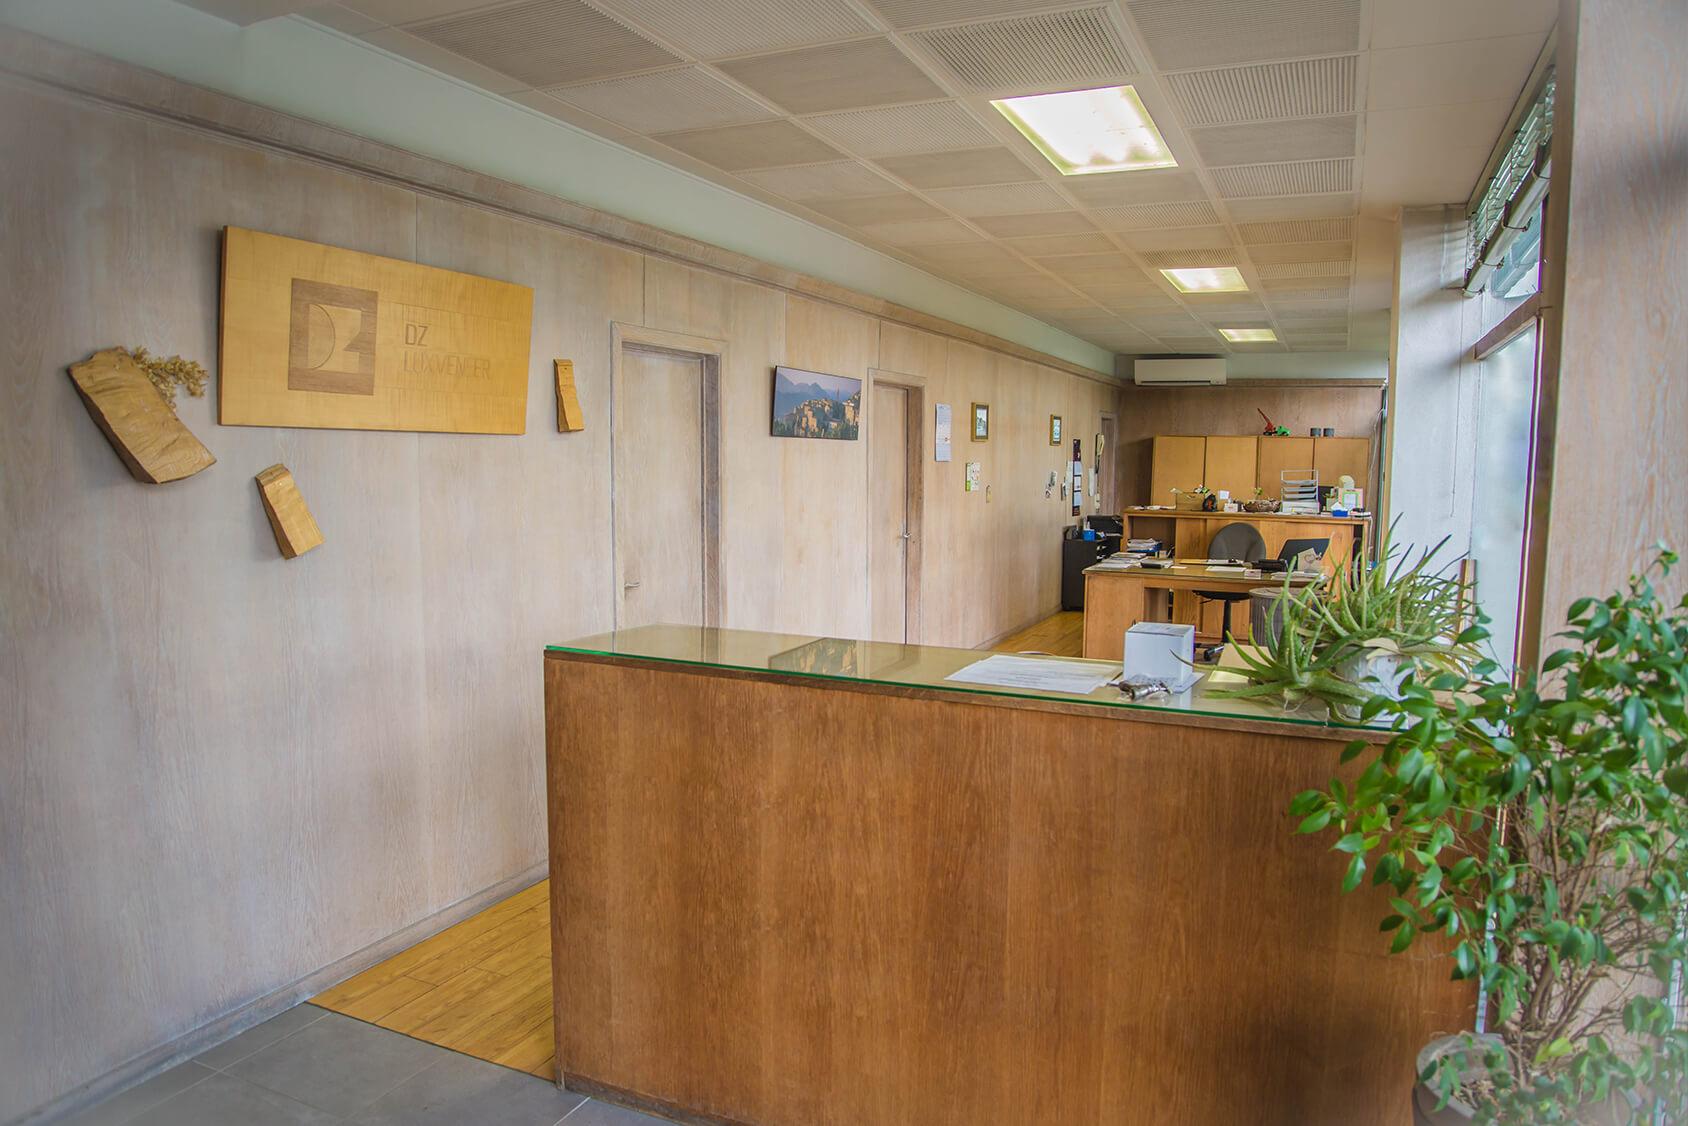 Zucarlux Arlon location entrepot manutention recyclage bois Luxembourg